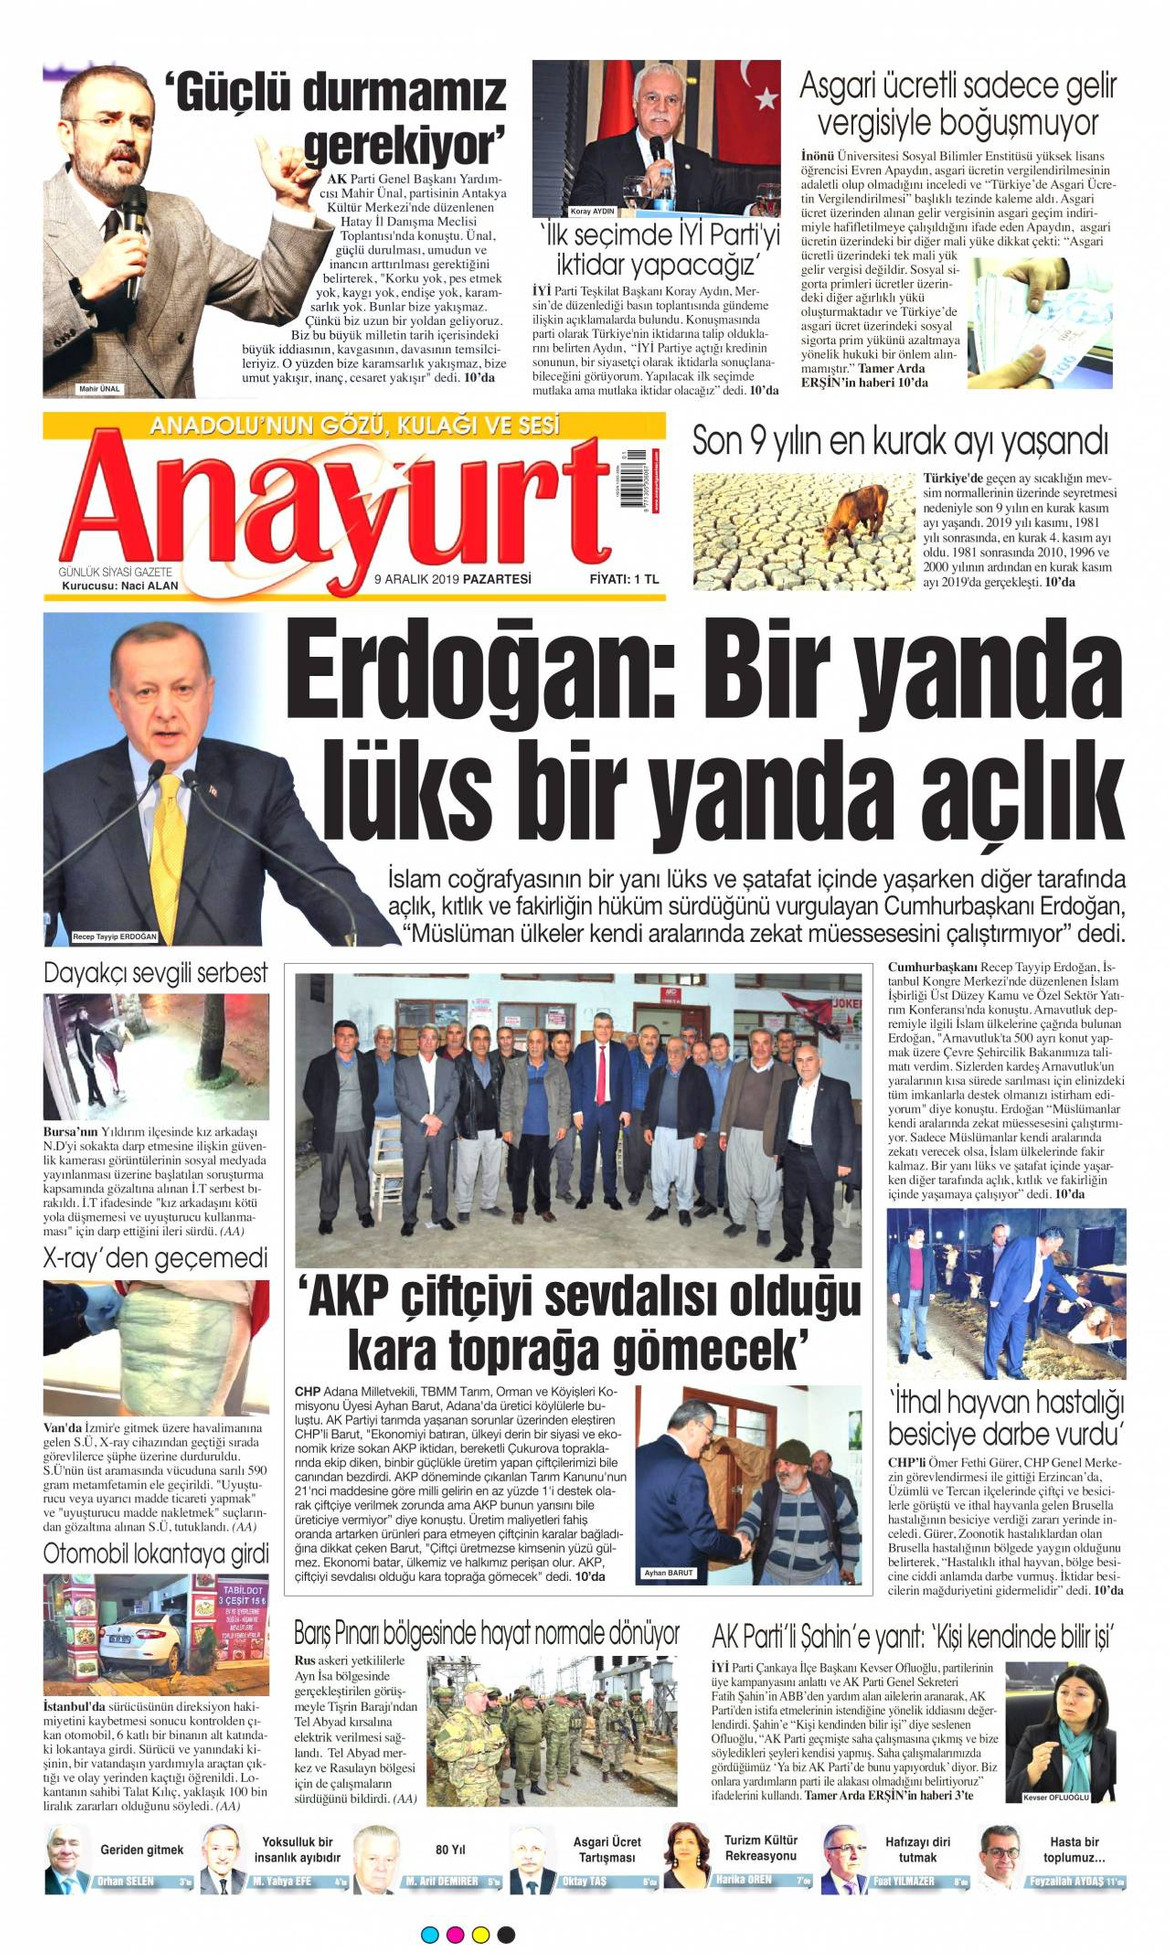 Anayurt gazetesi manşet ilk sayfa oku